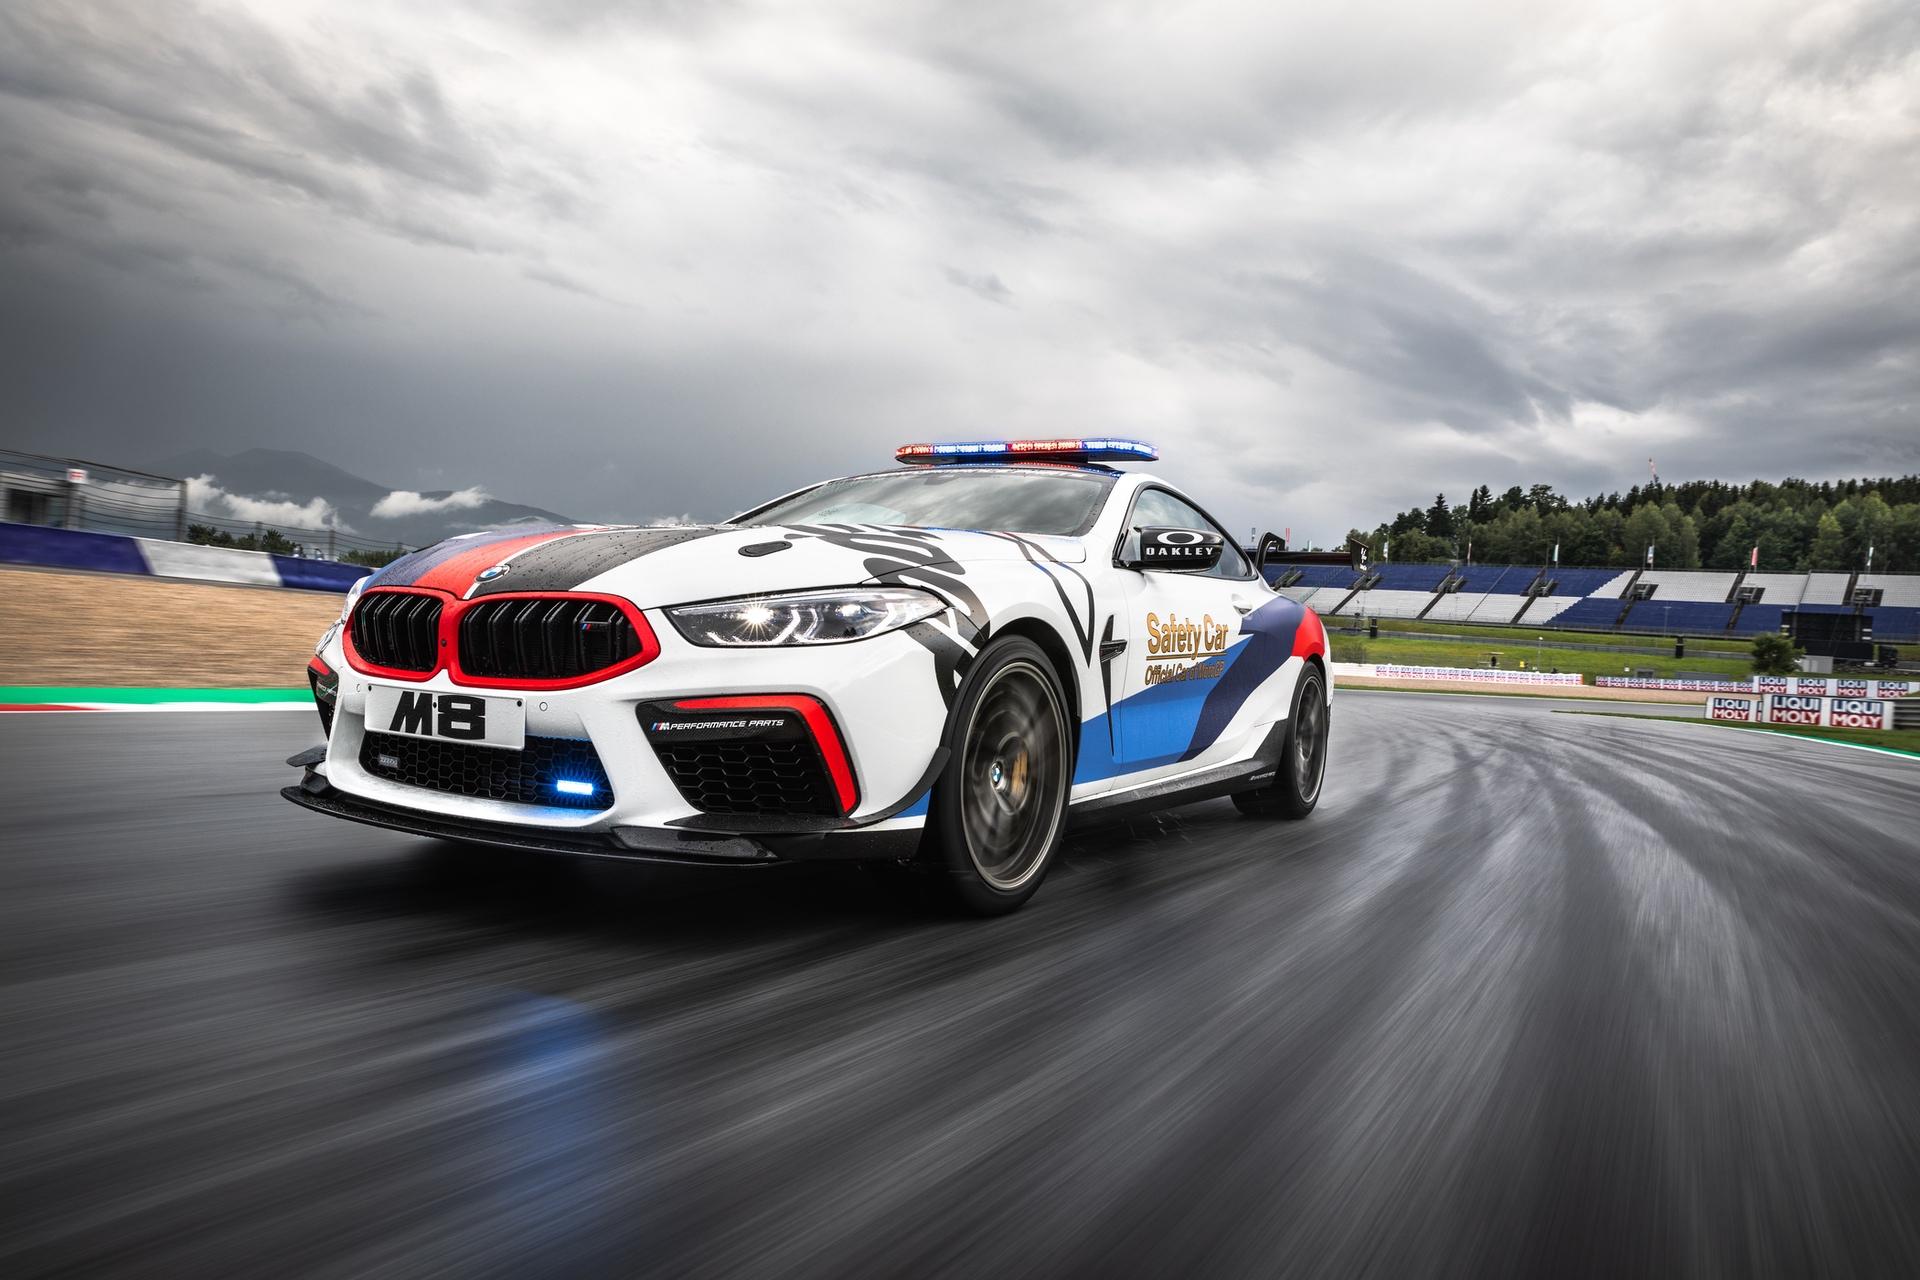 BMW_M8_MotoGP_Safety_Car_0001